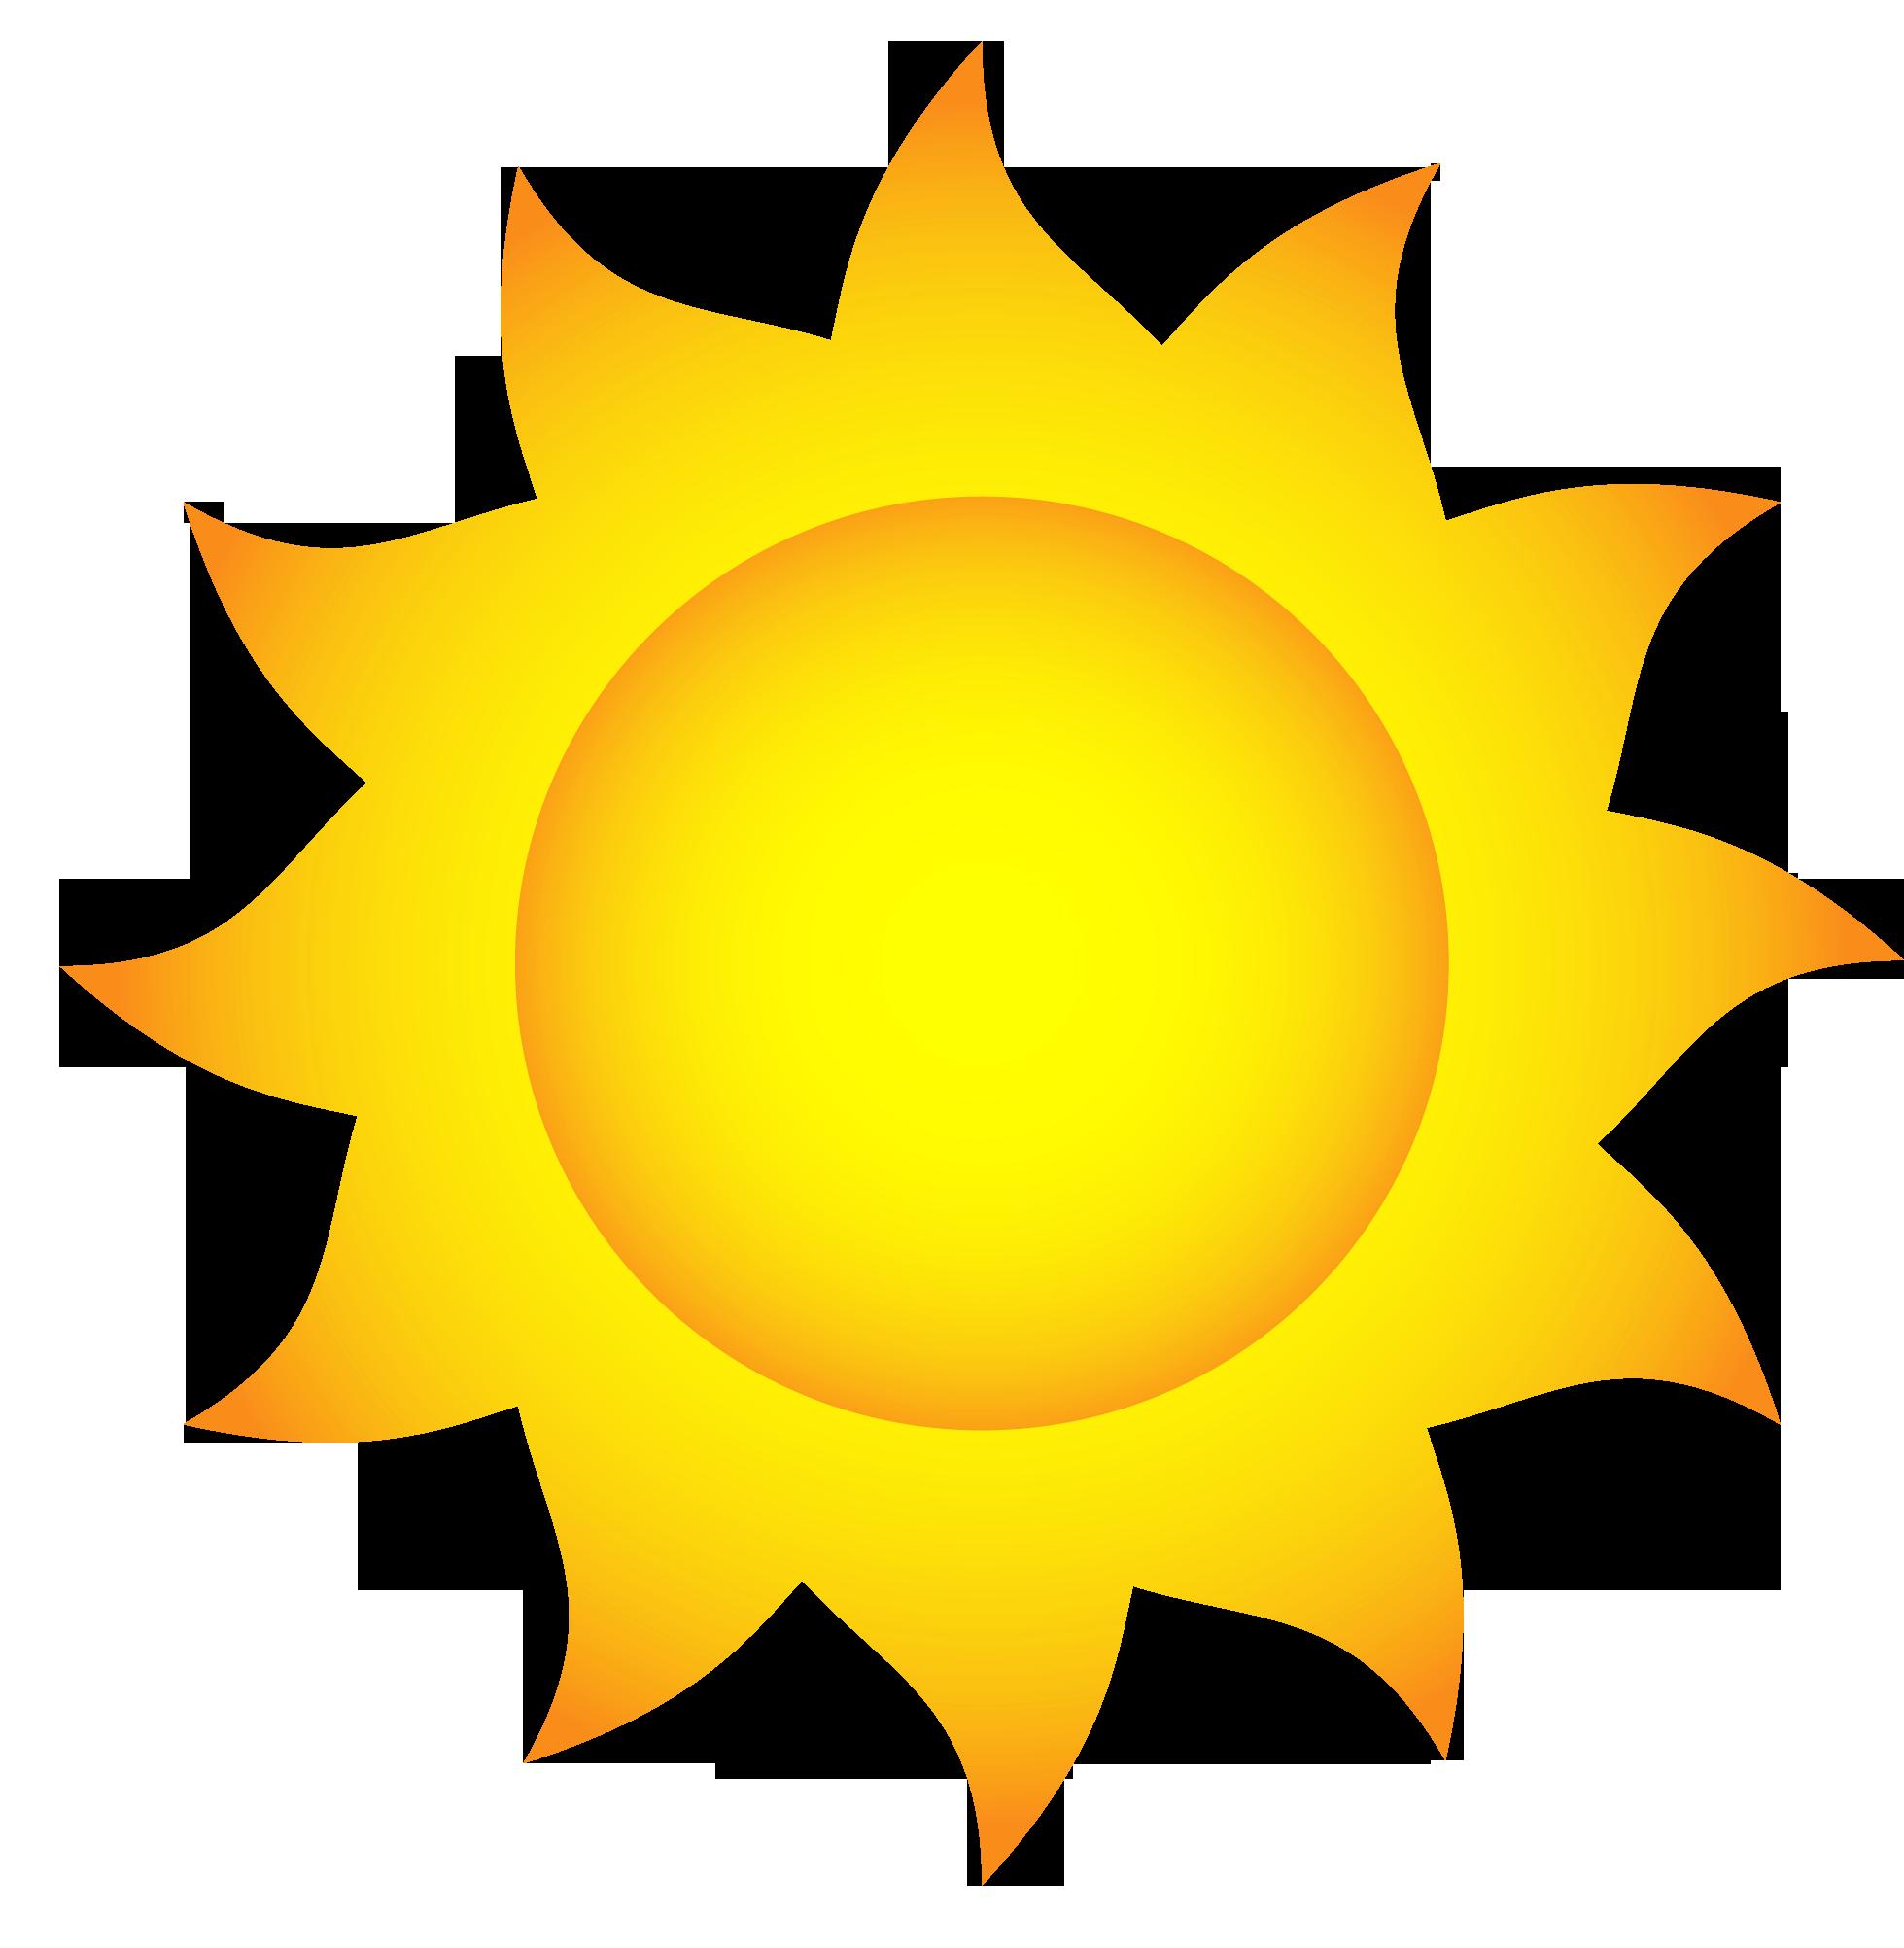 Clipart sun afternoon. Transparent png picture klipart